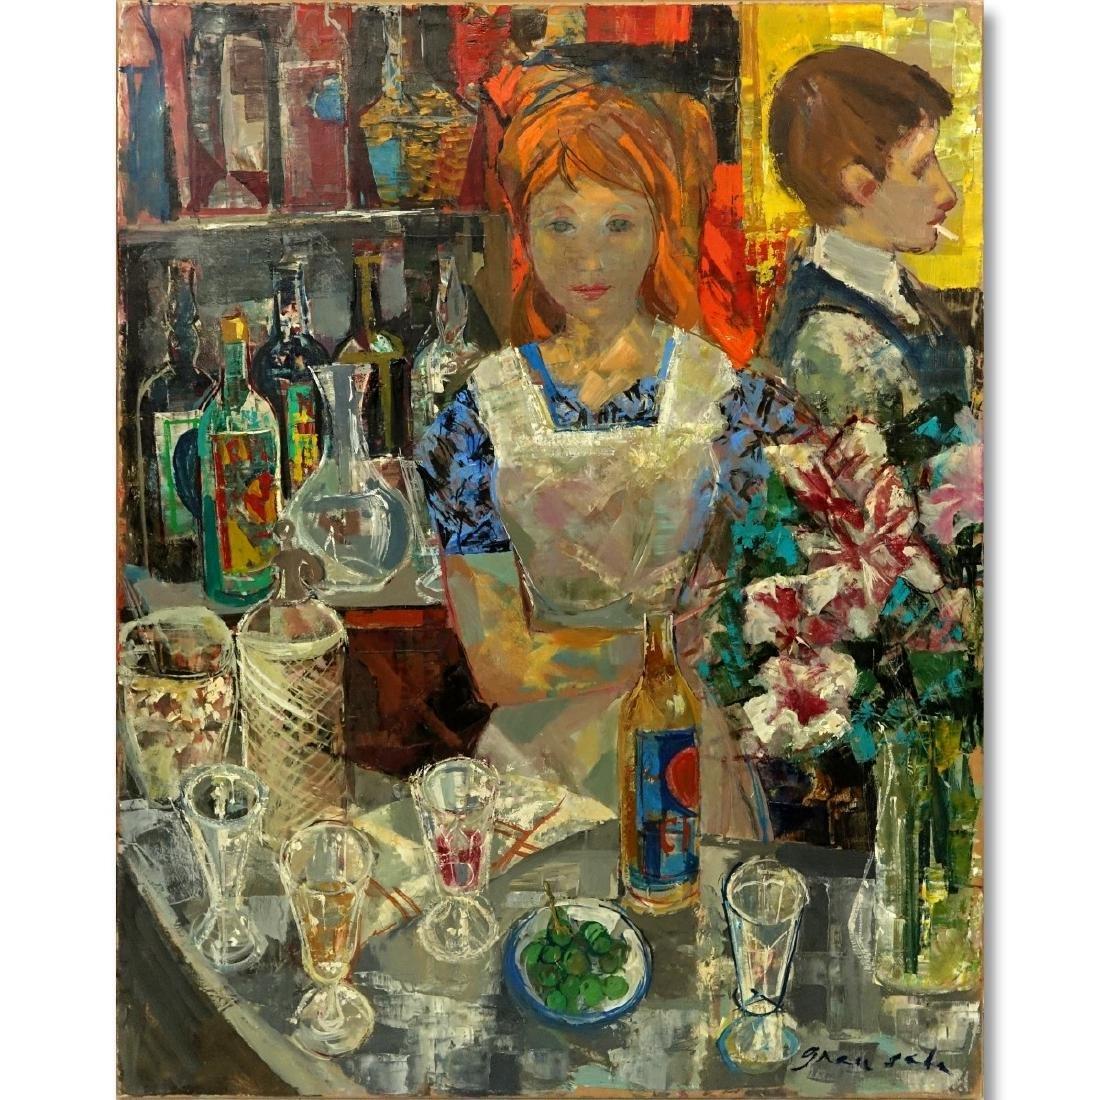 Emilio Grau-Sala, Spanish  (1911 - 1975) Oil